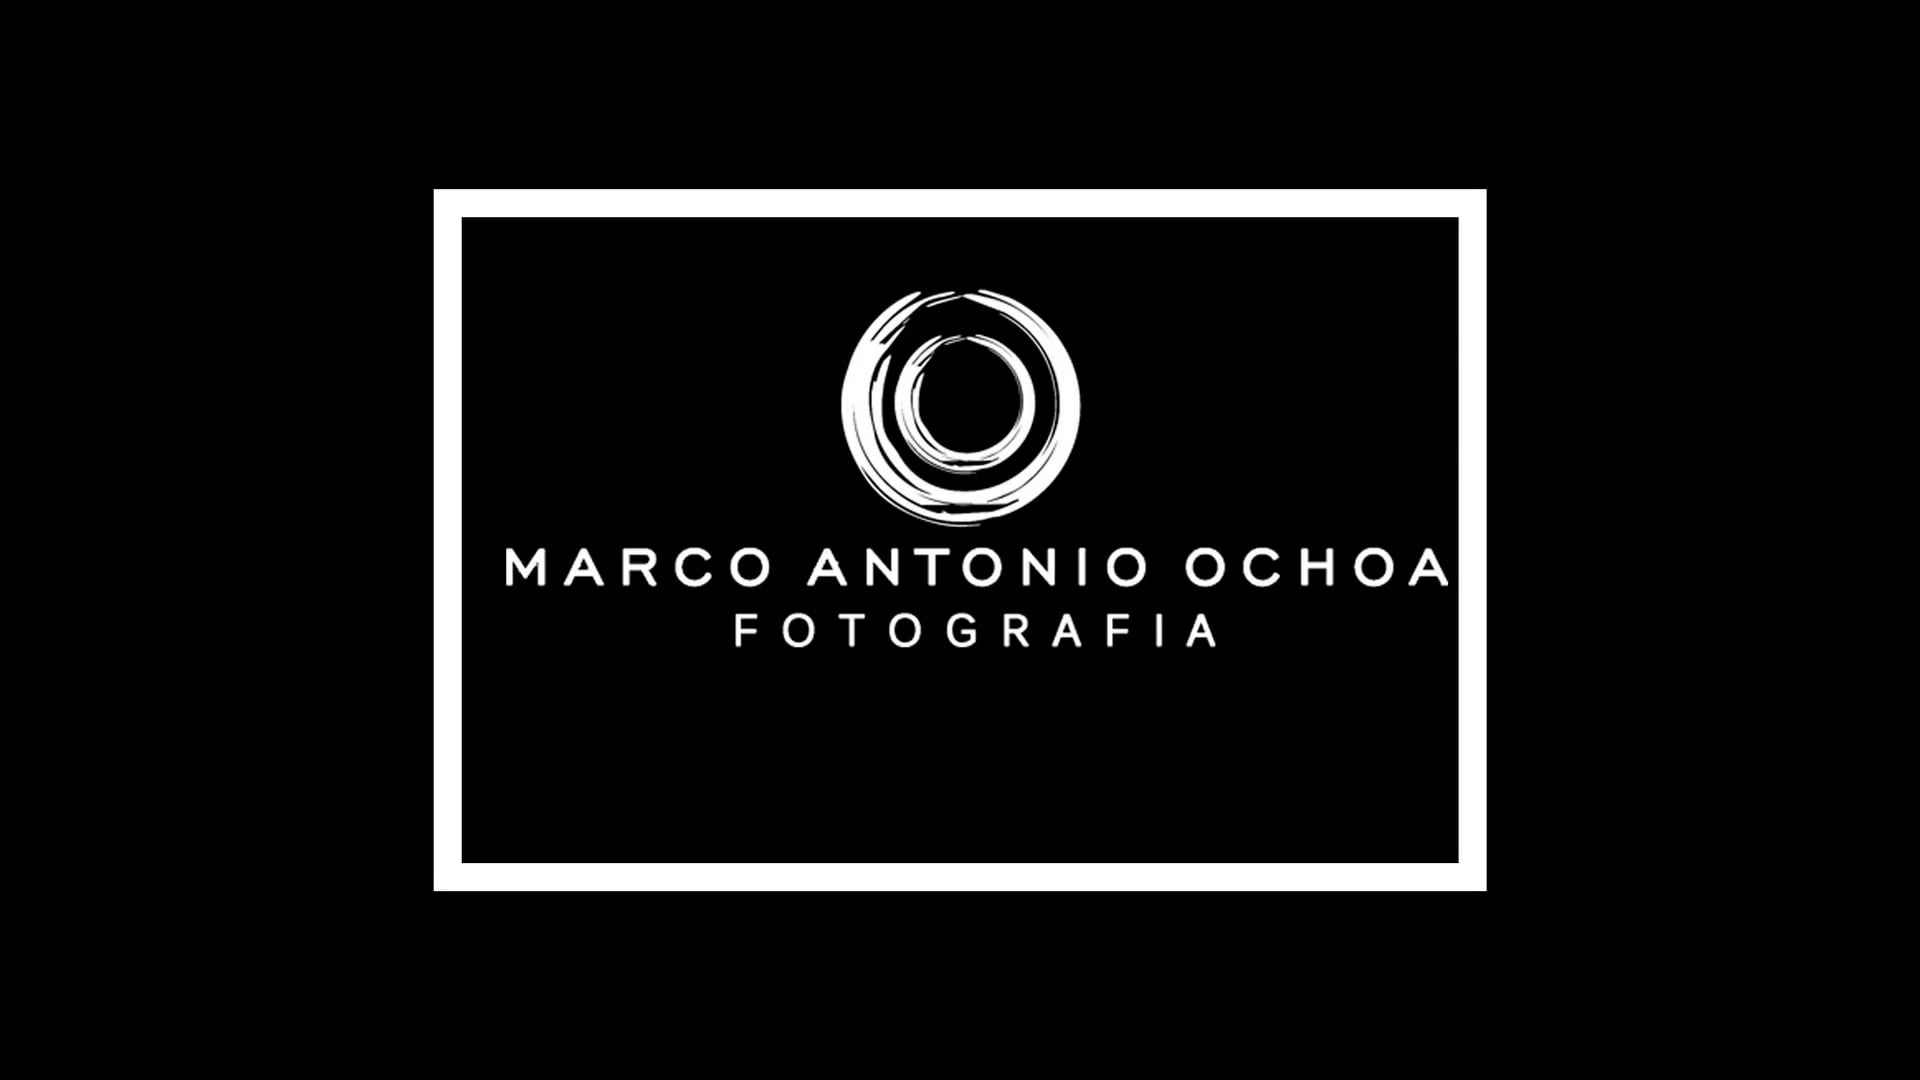 Marco Antonio Ochoa